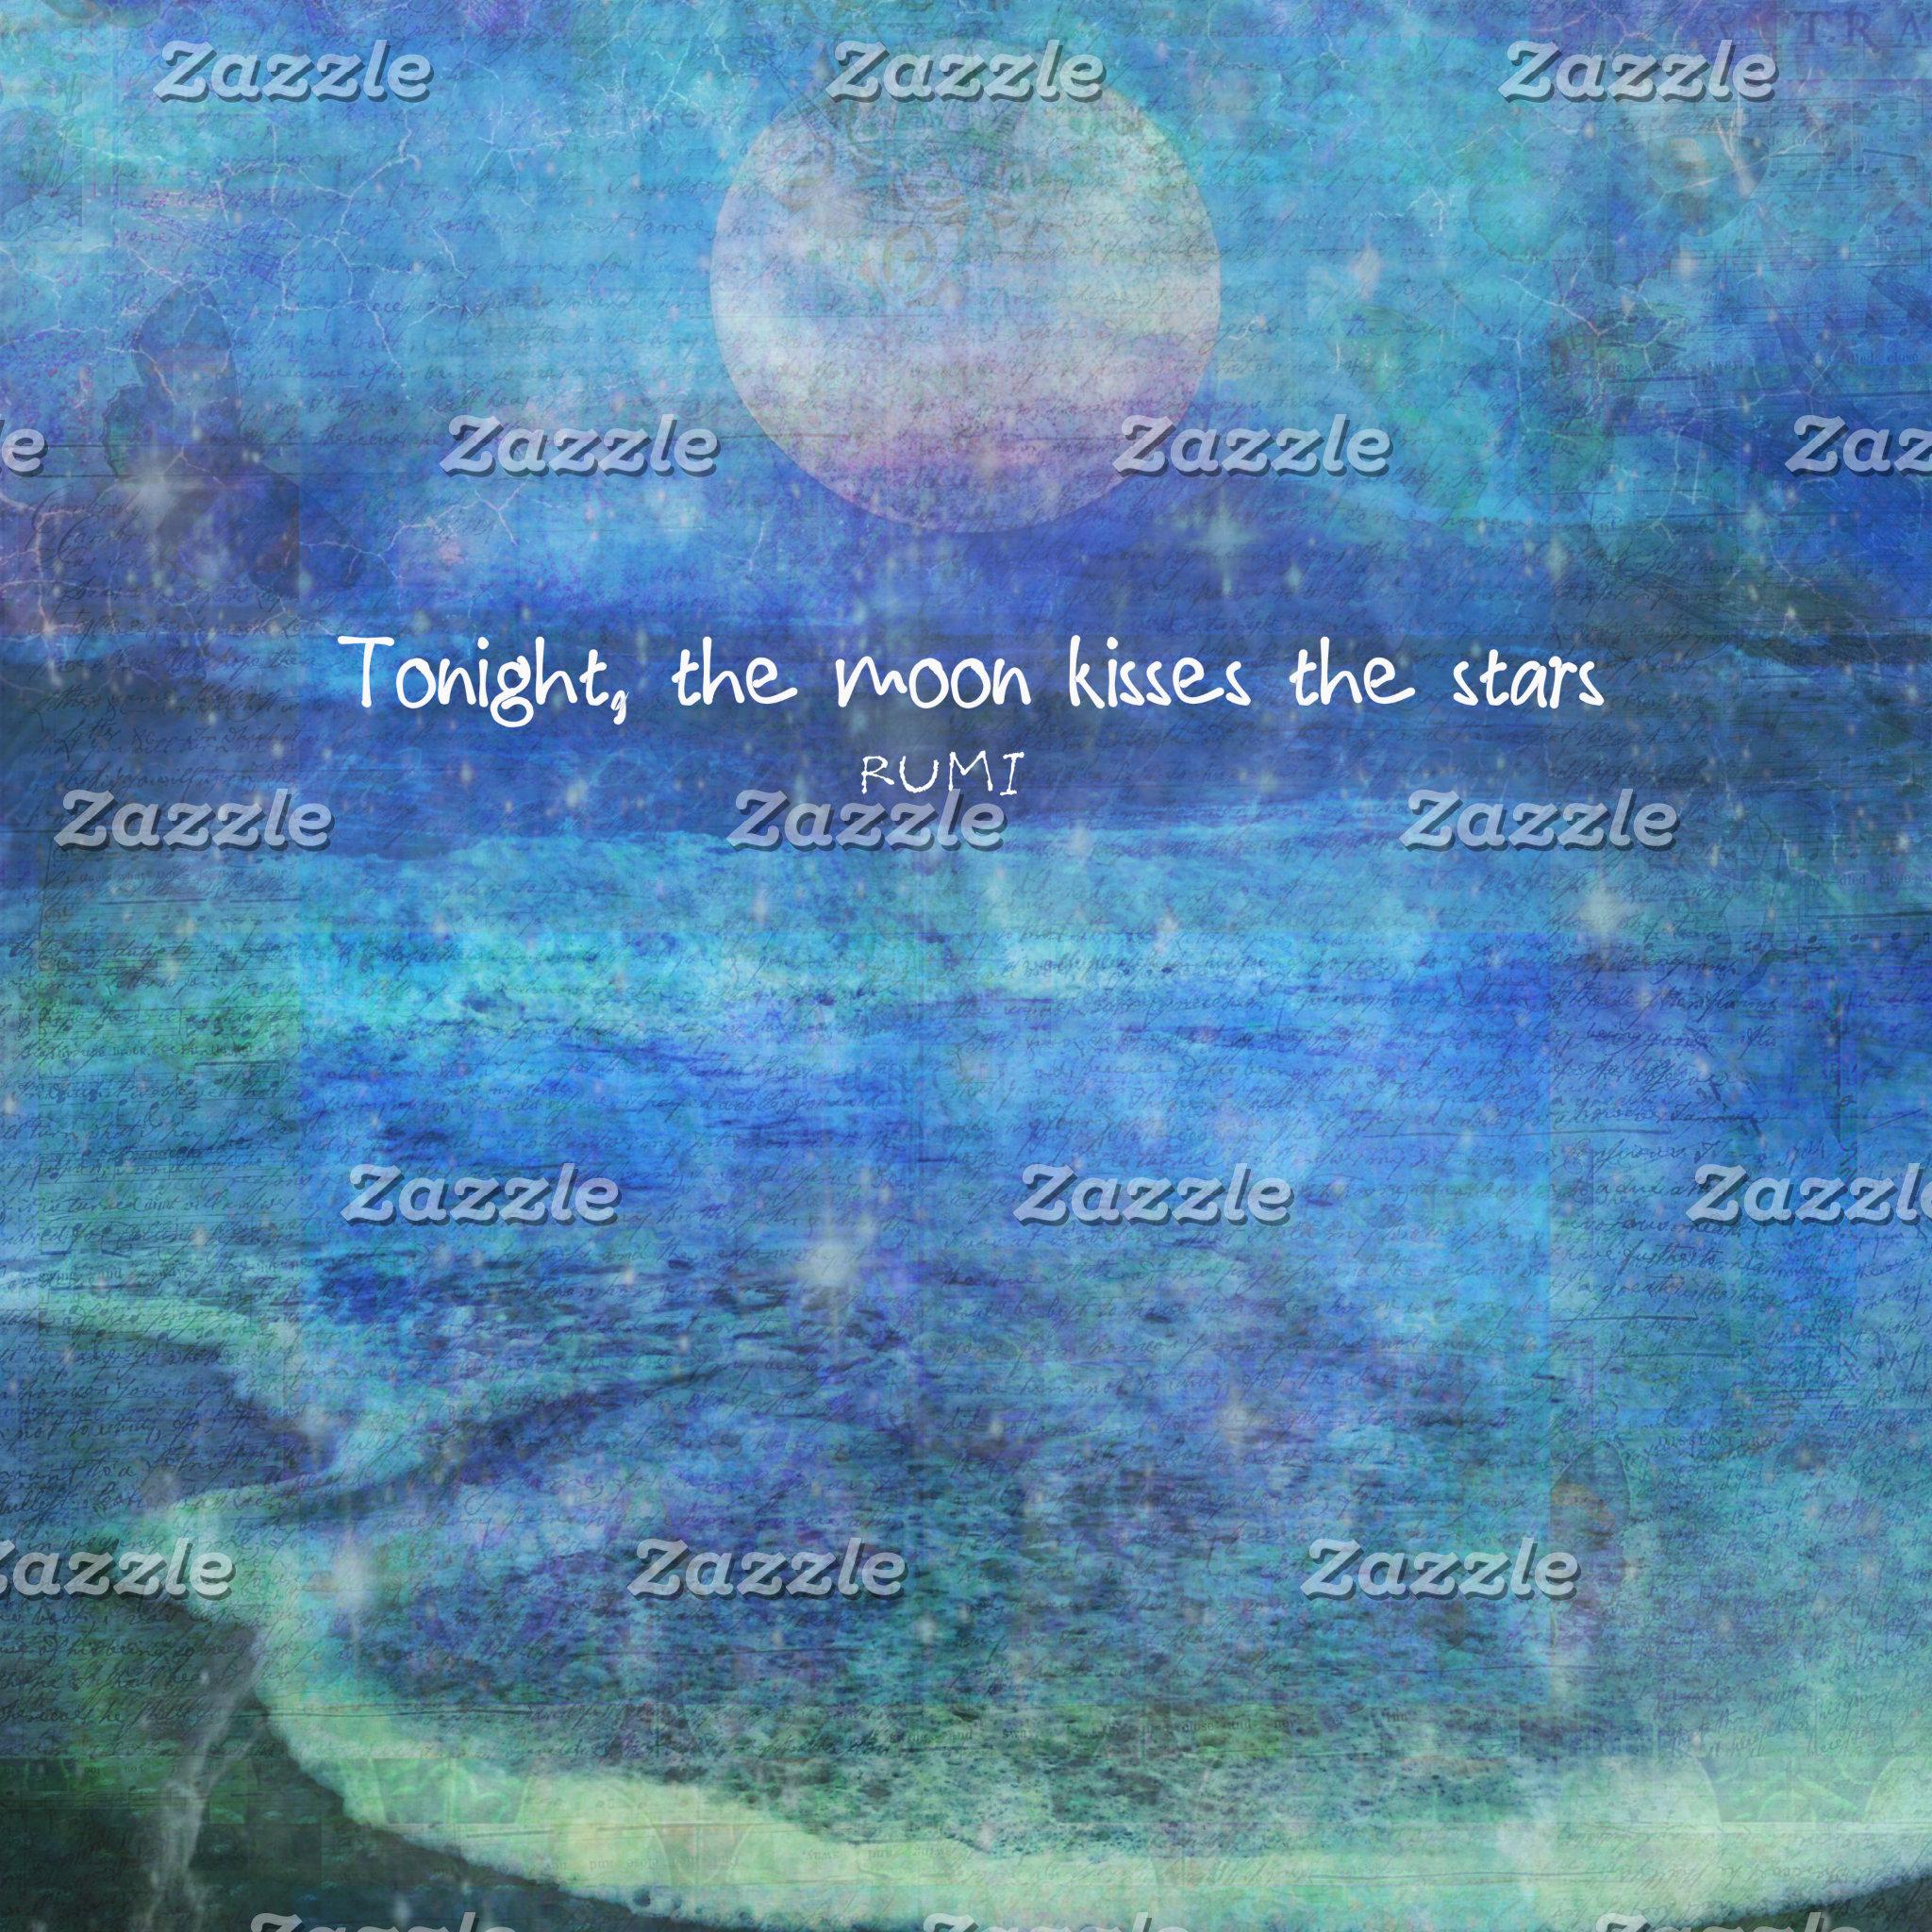 "Tonight, the moon kisses the stars."" - Rumi"